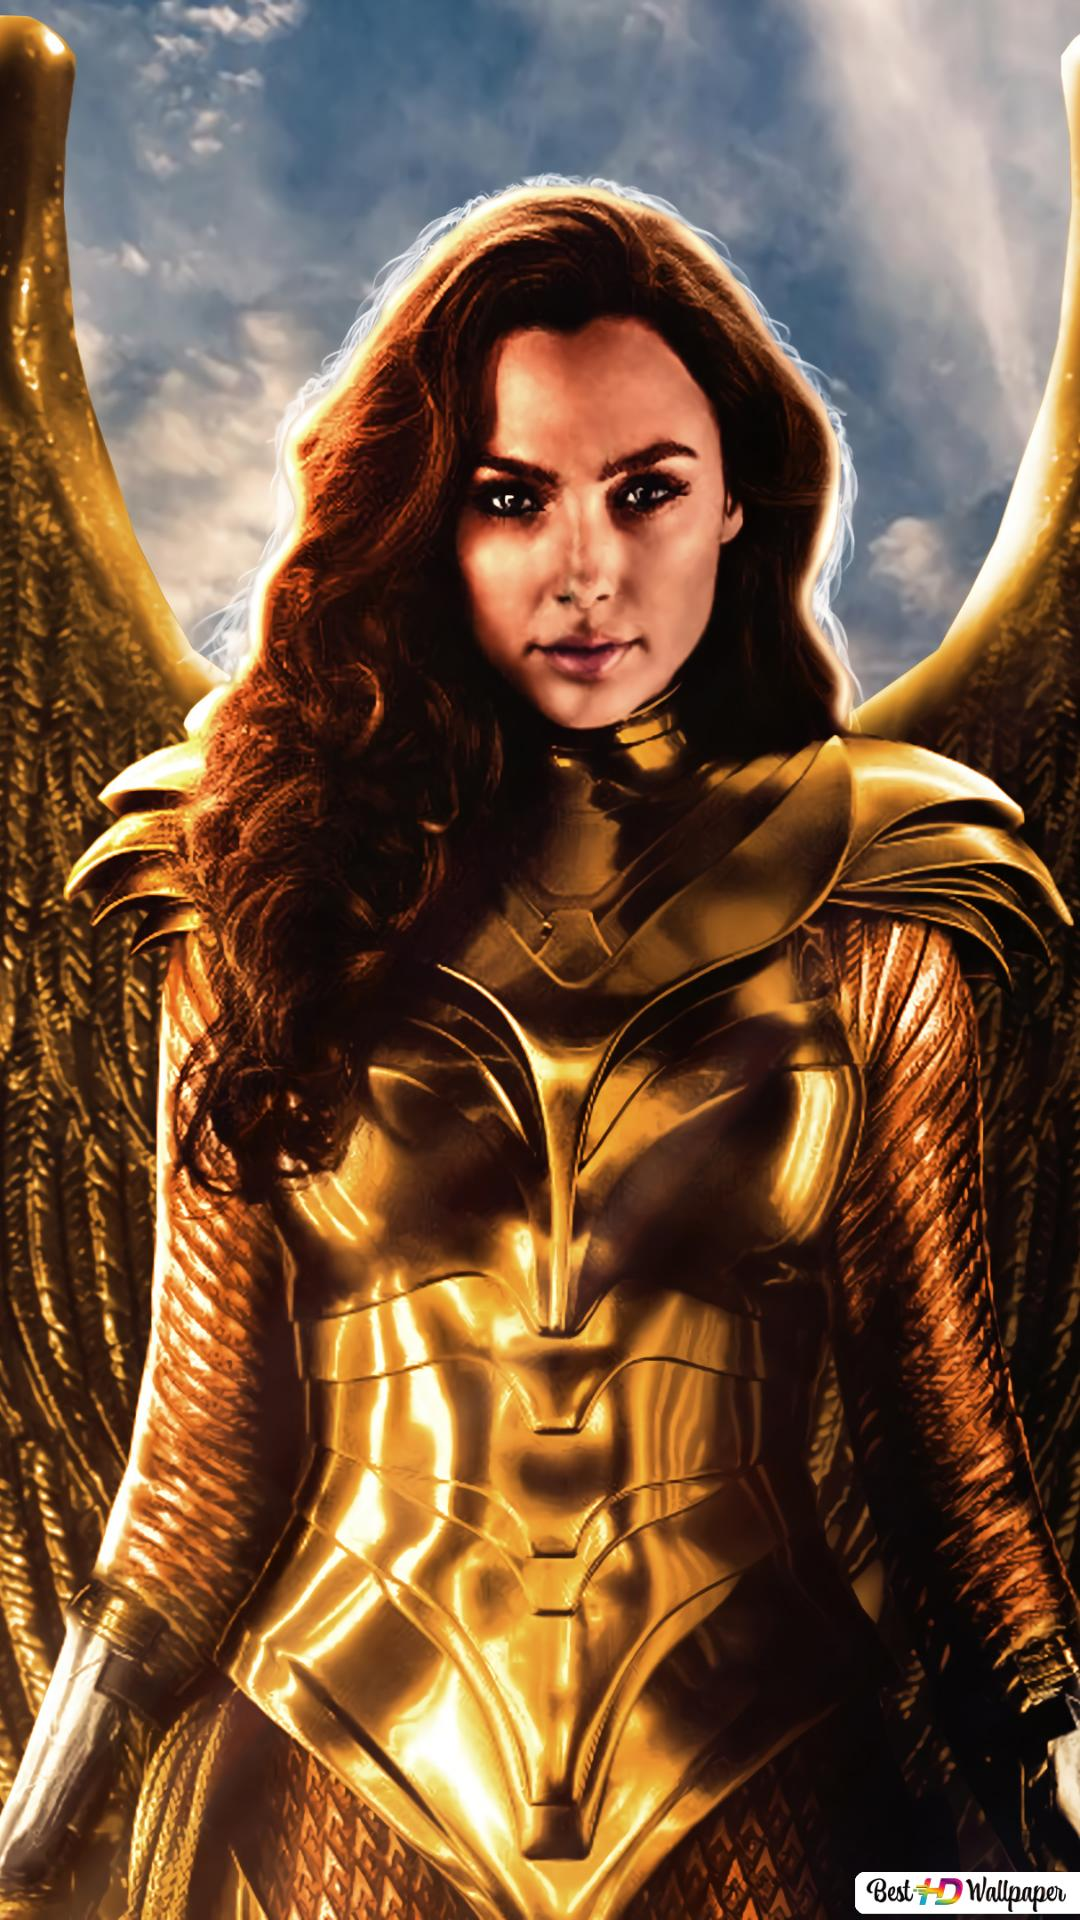 Wonder Woman 1984 Golden Armor Hd Wallpaper Download